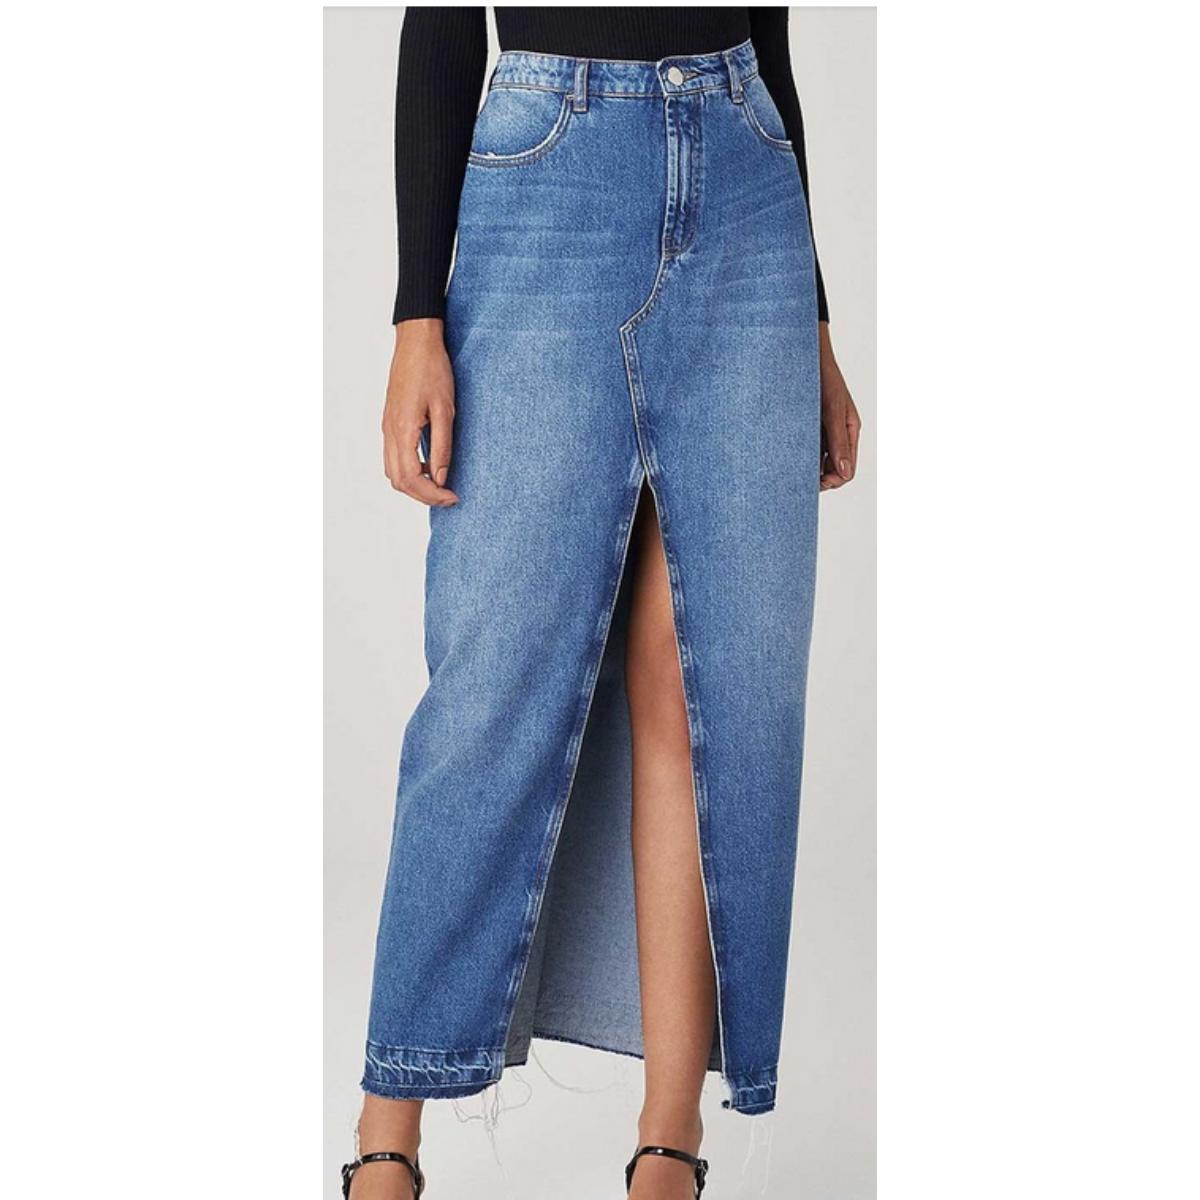 Saia Feminina Dzarm Zb3z 1asn Jeans